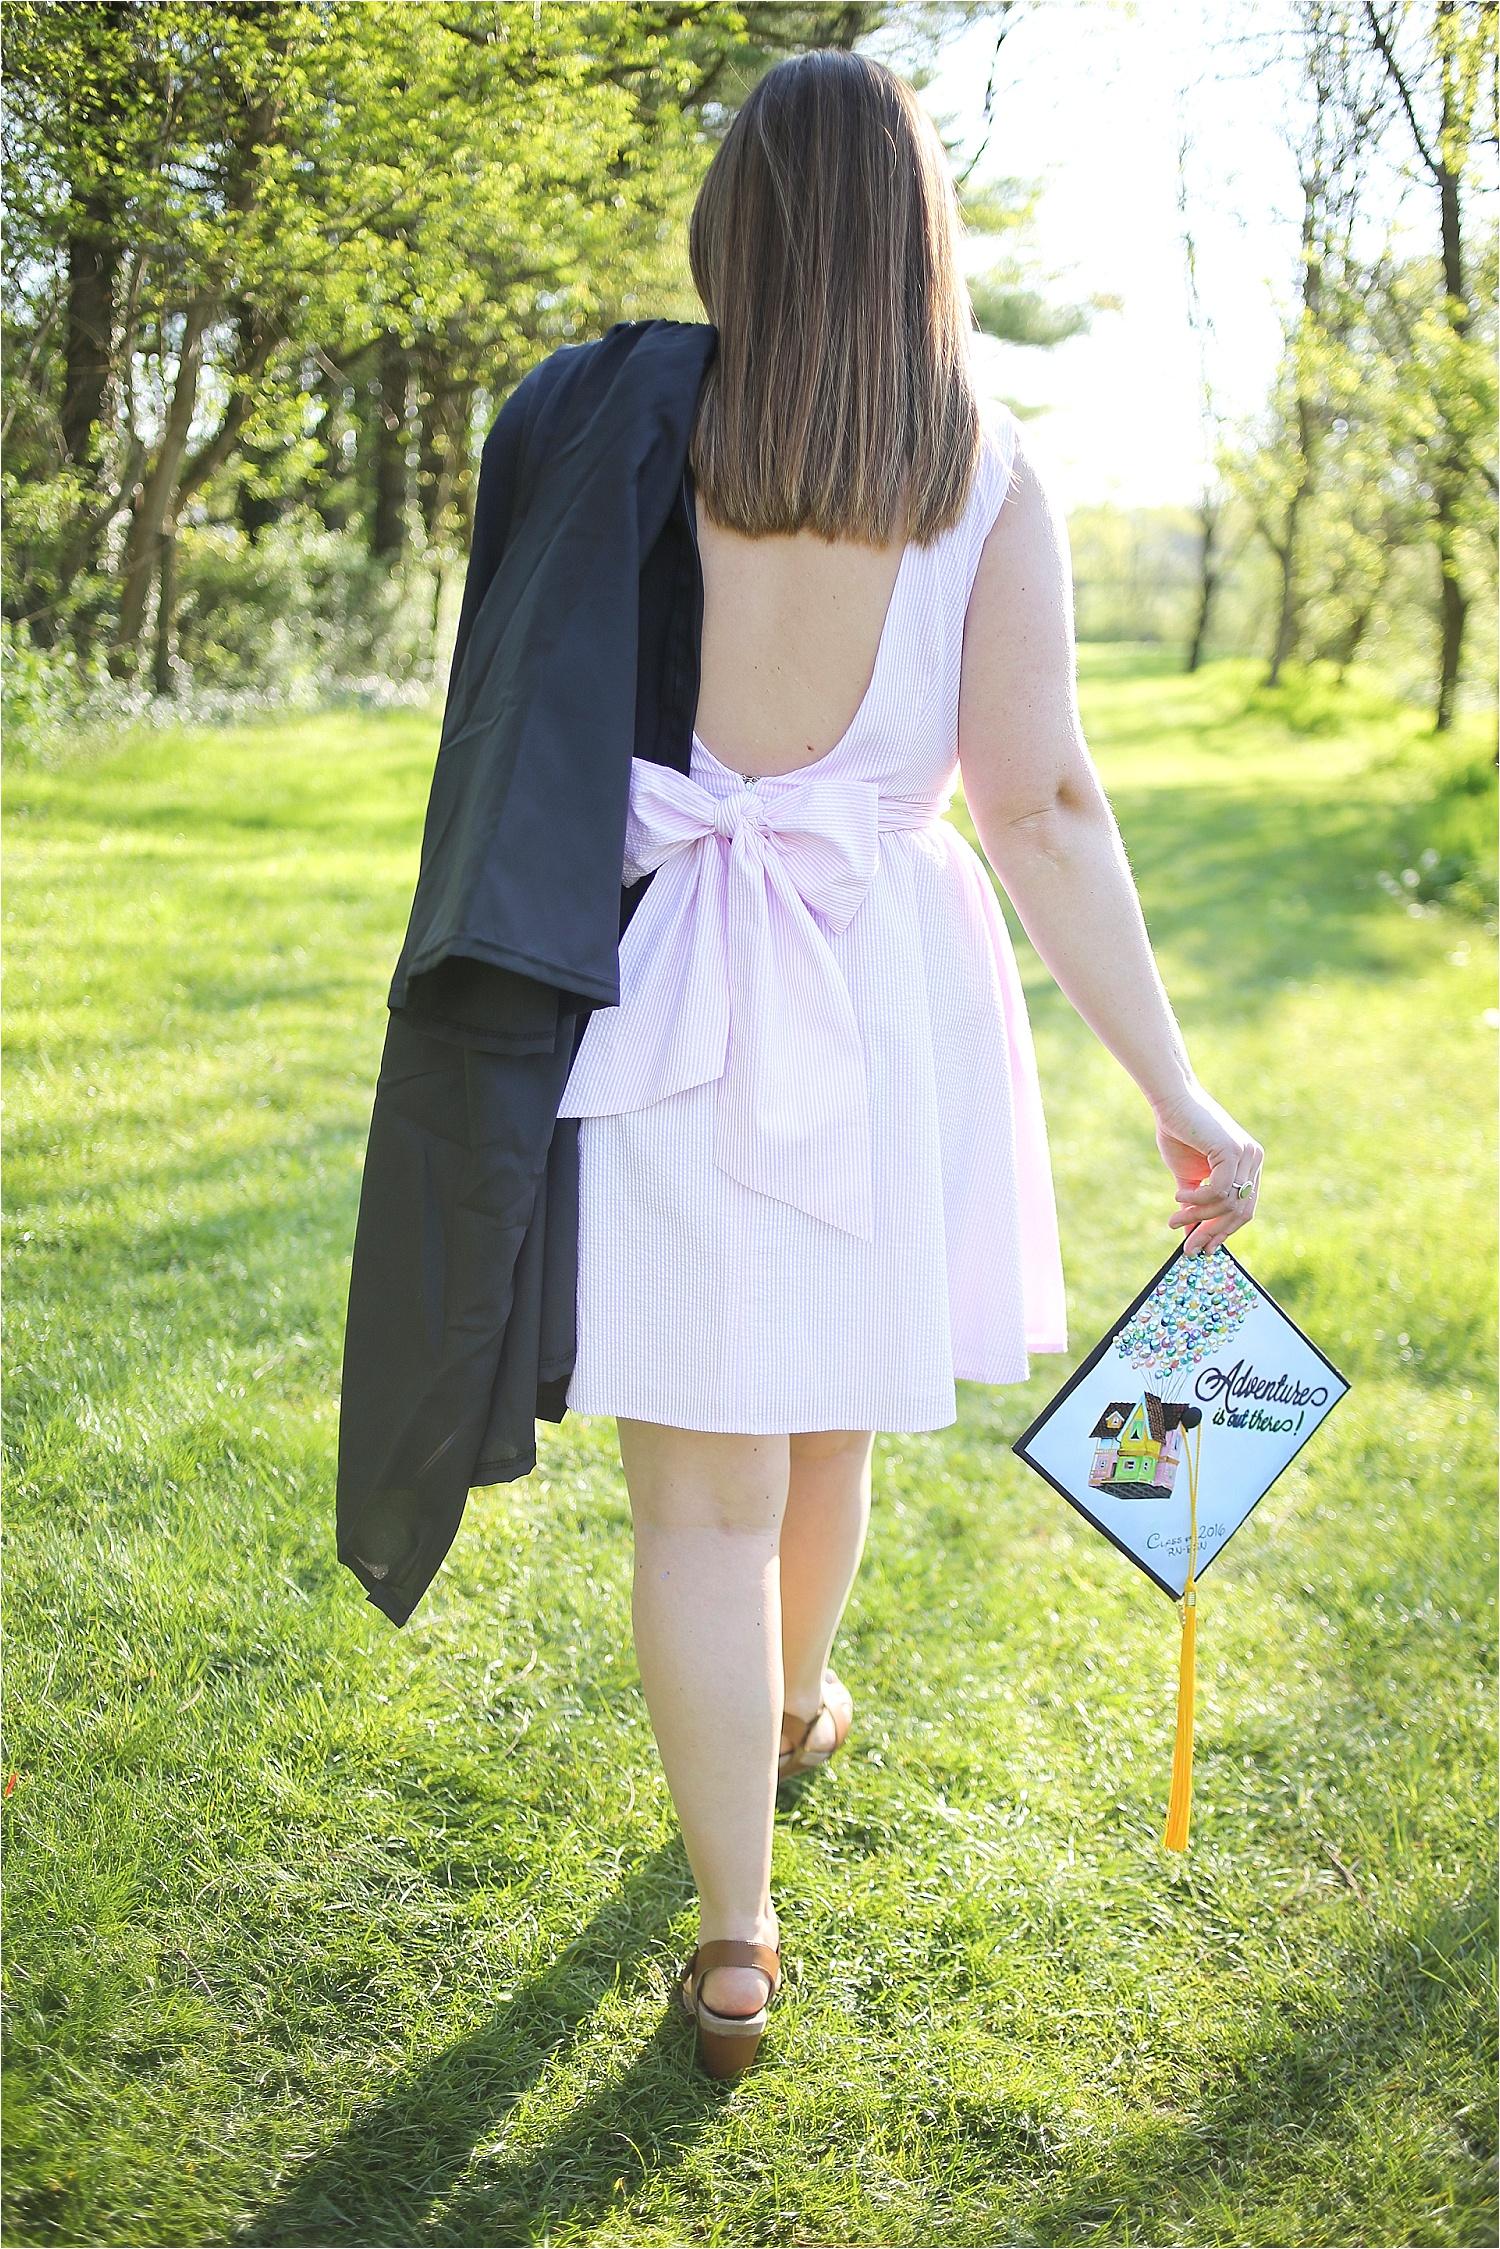 Blacksburg-Senior-Portrait-Photographer-Nursing-School-Graduation-Photos-_0011.jpg